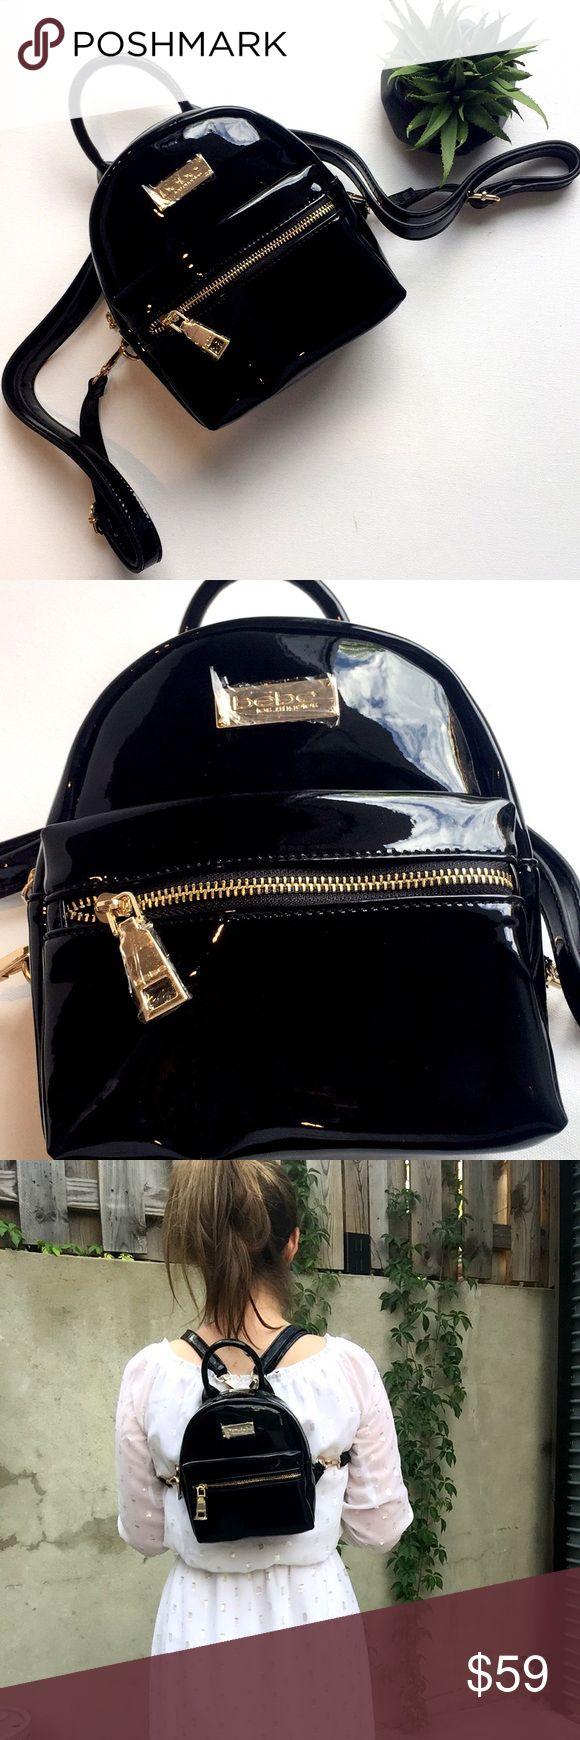 "NWOTs Bebe Mini Black Backpack NWOTS Bebe Cute backpack in a chic shiny design. Goldtone hardware adds a haute touch. Detachable adjustable straps. Goldtone bebe logo plate. 100% Polyurethane Imported Height: 9"" (23 cm), width: 7.5"" (19 cm), depth: 4"" (10.25 cm)  Top zip closure. bebe Bags Backpacks"